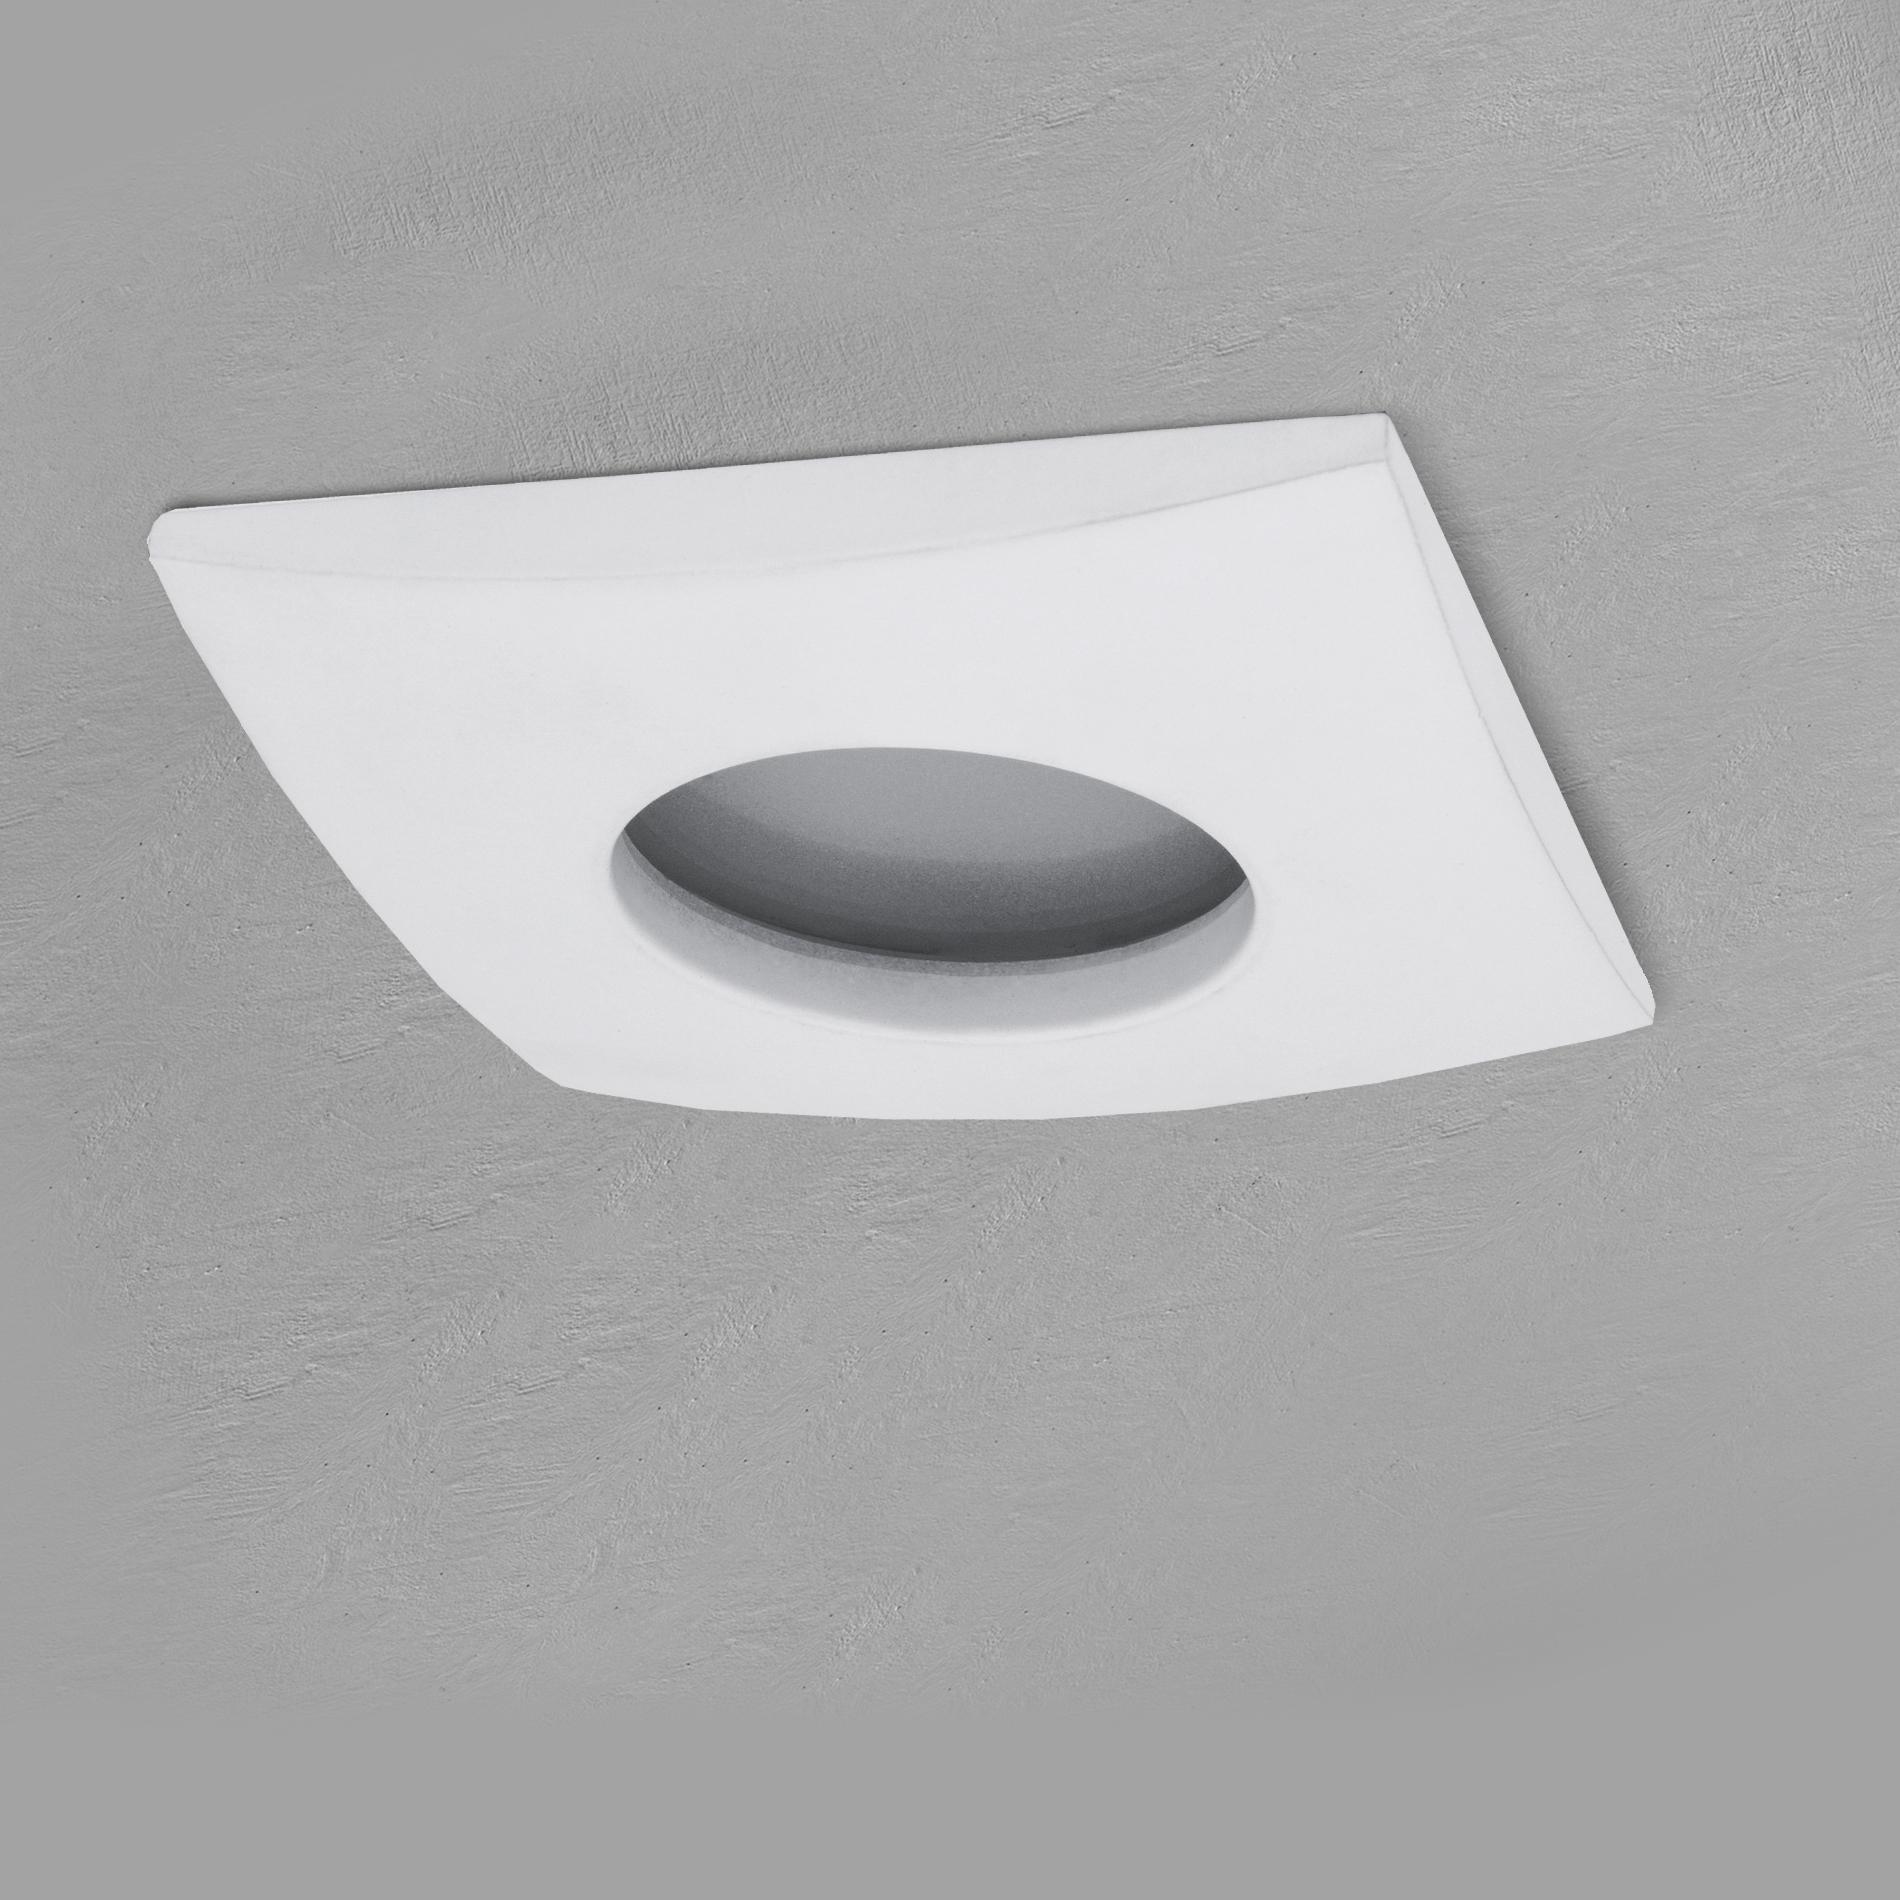 qw 1 feuchtraum led einbaustrahler spot bad ip65 matt wei 5w gu10 led warmwei. Black Bedroom Furniture Sets. Home Design Ideas